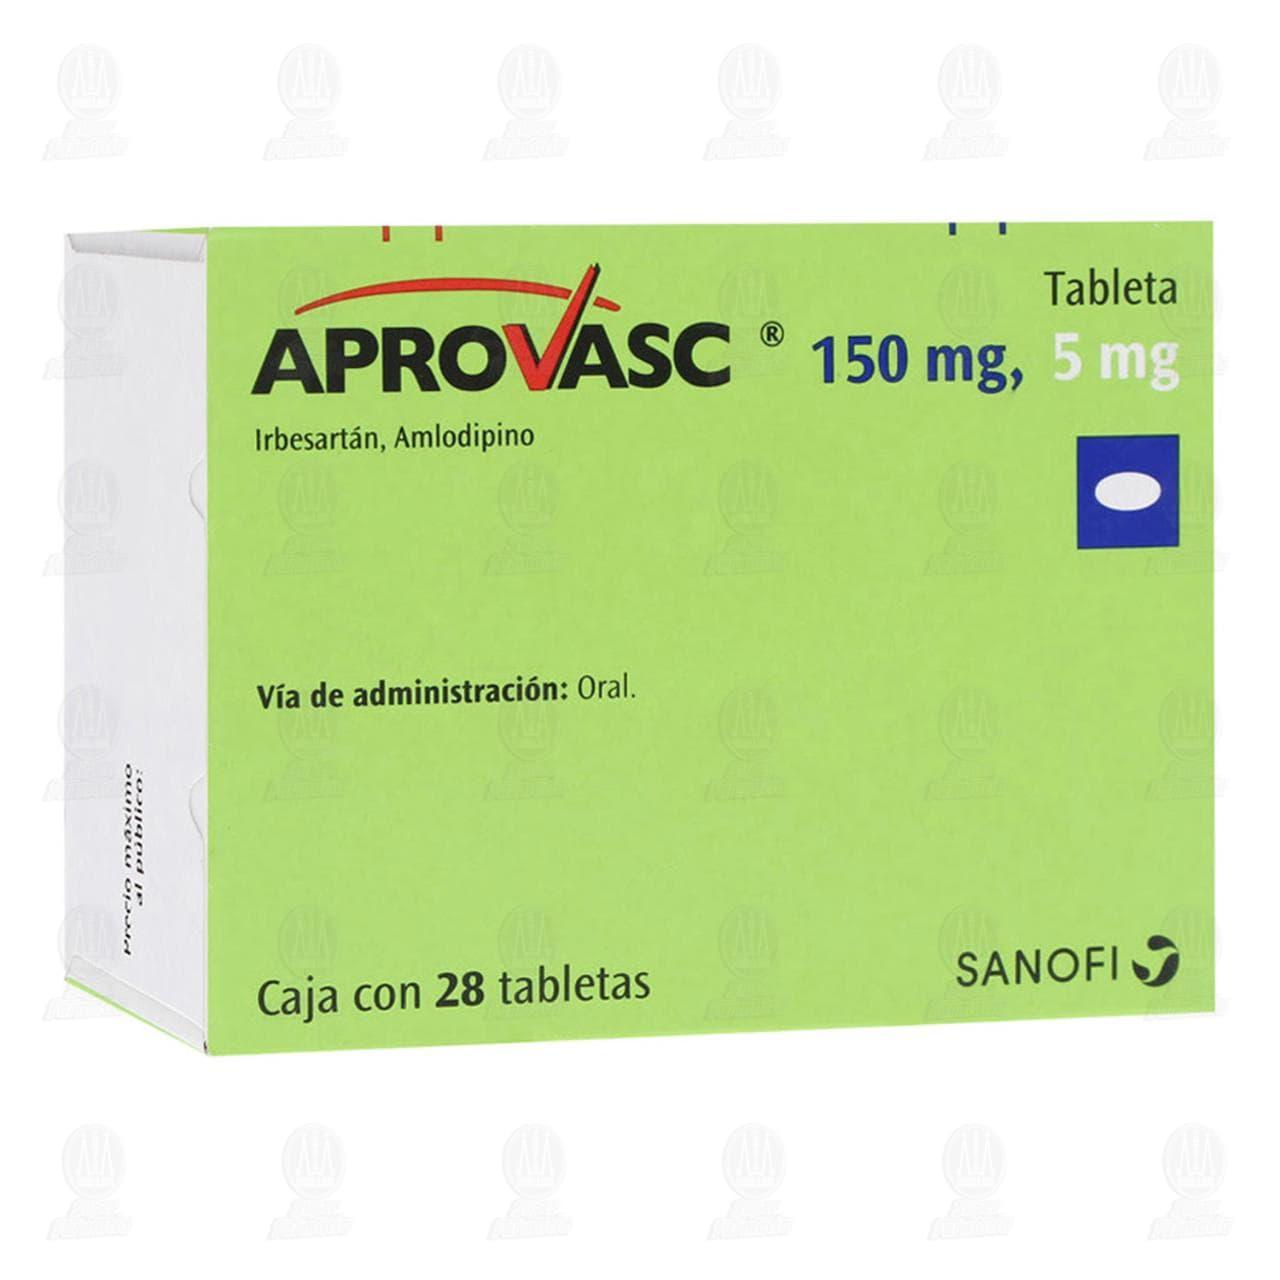 Comprar Aprovasc 150/5mg 28 Tabletas en Farmacias Guadalajara